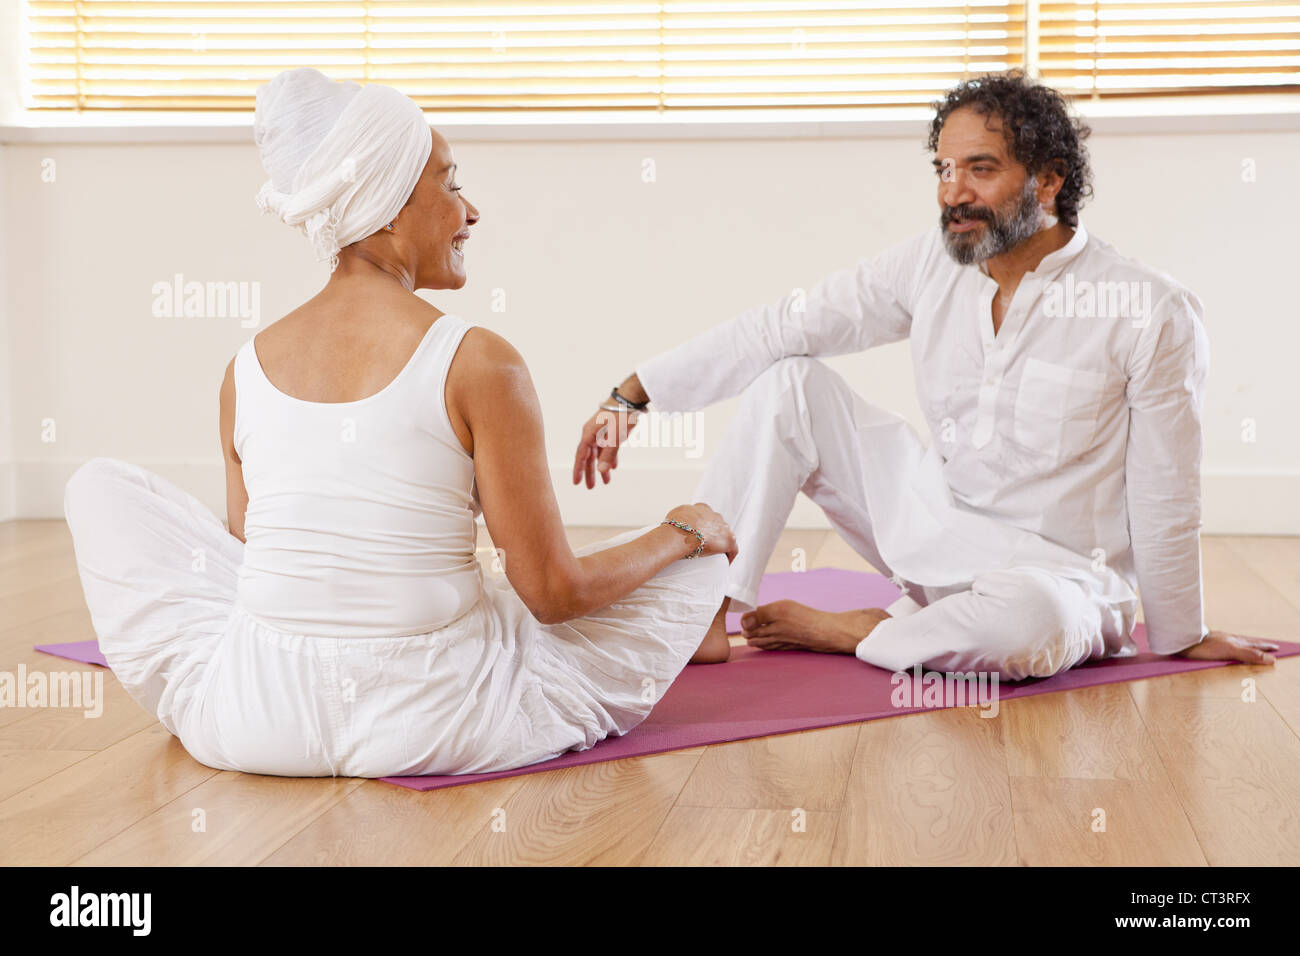 Couple talking on yoga mats - Stock Image